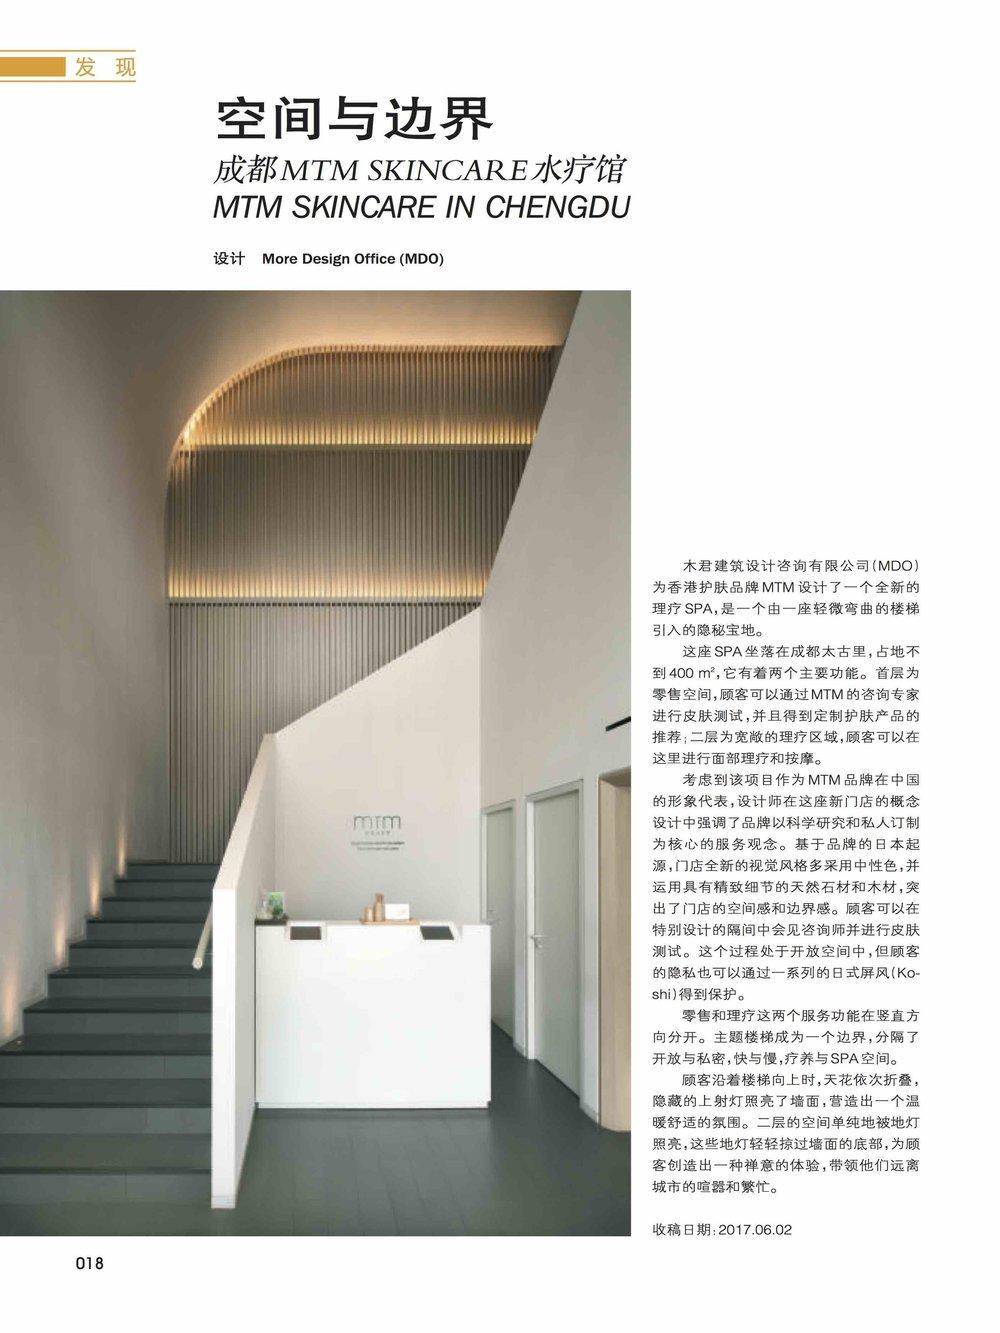 id+c | July 2017 - MTM Skincare Chengdu |More Design Office (MDO)